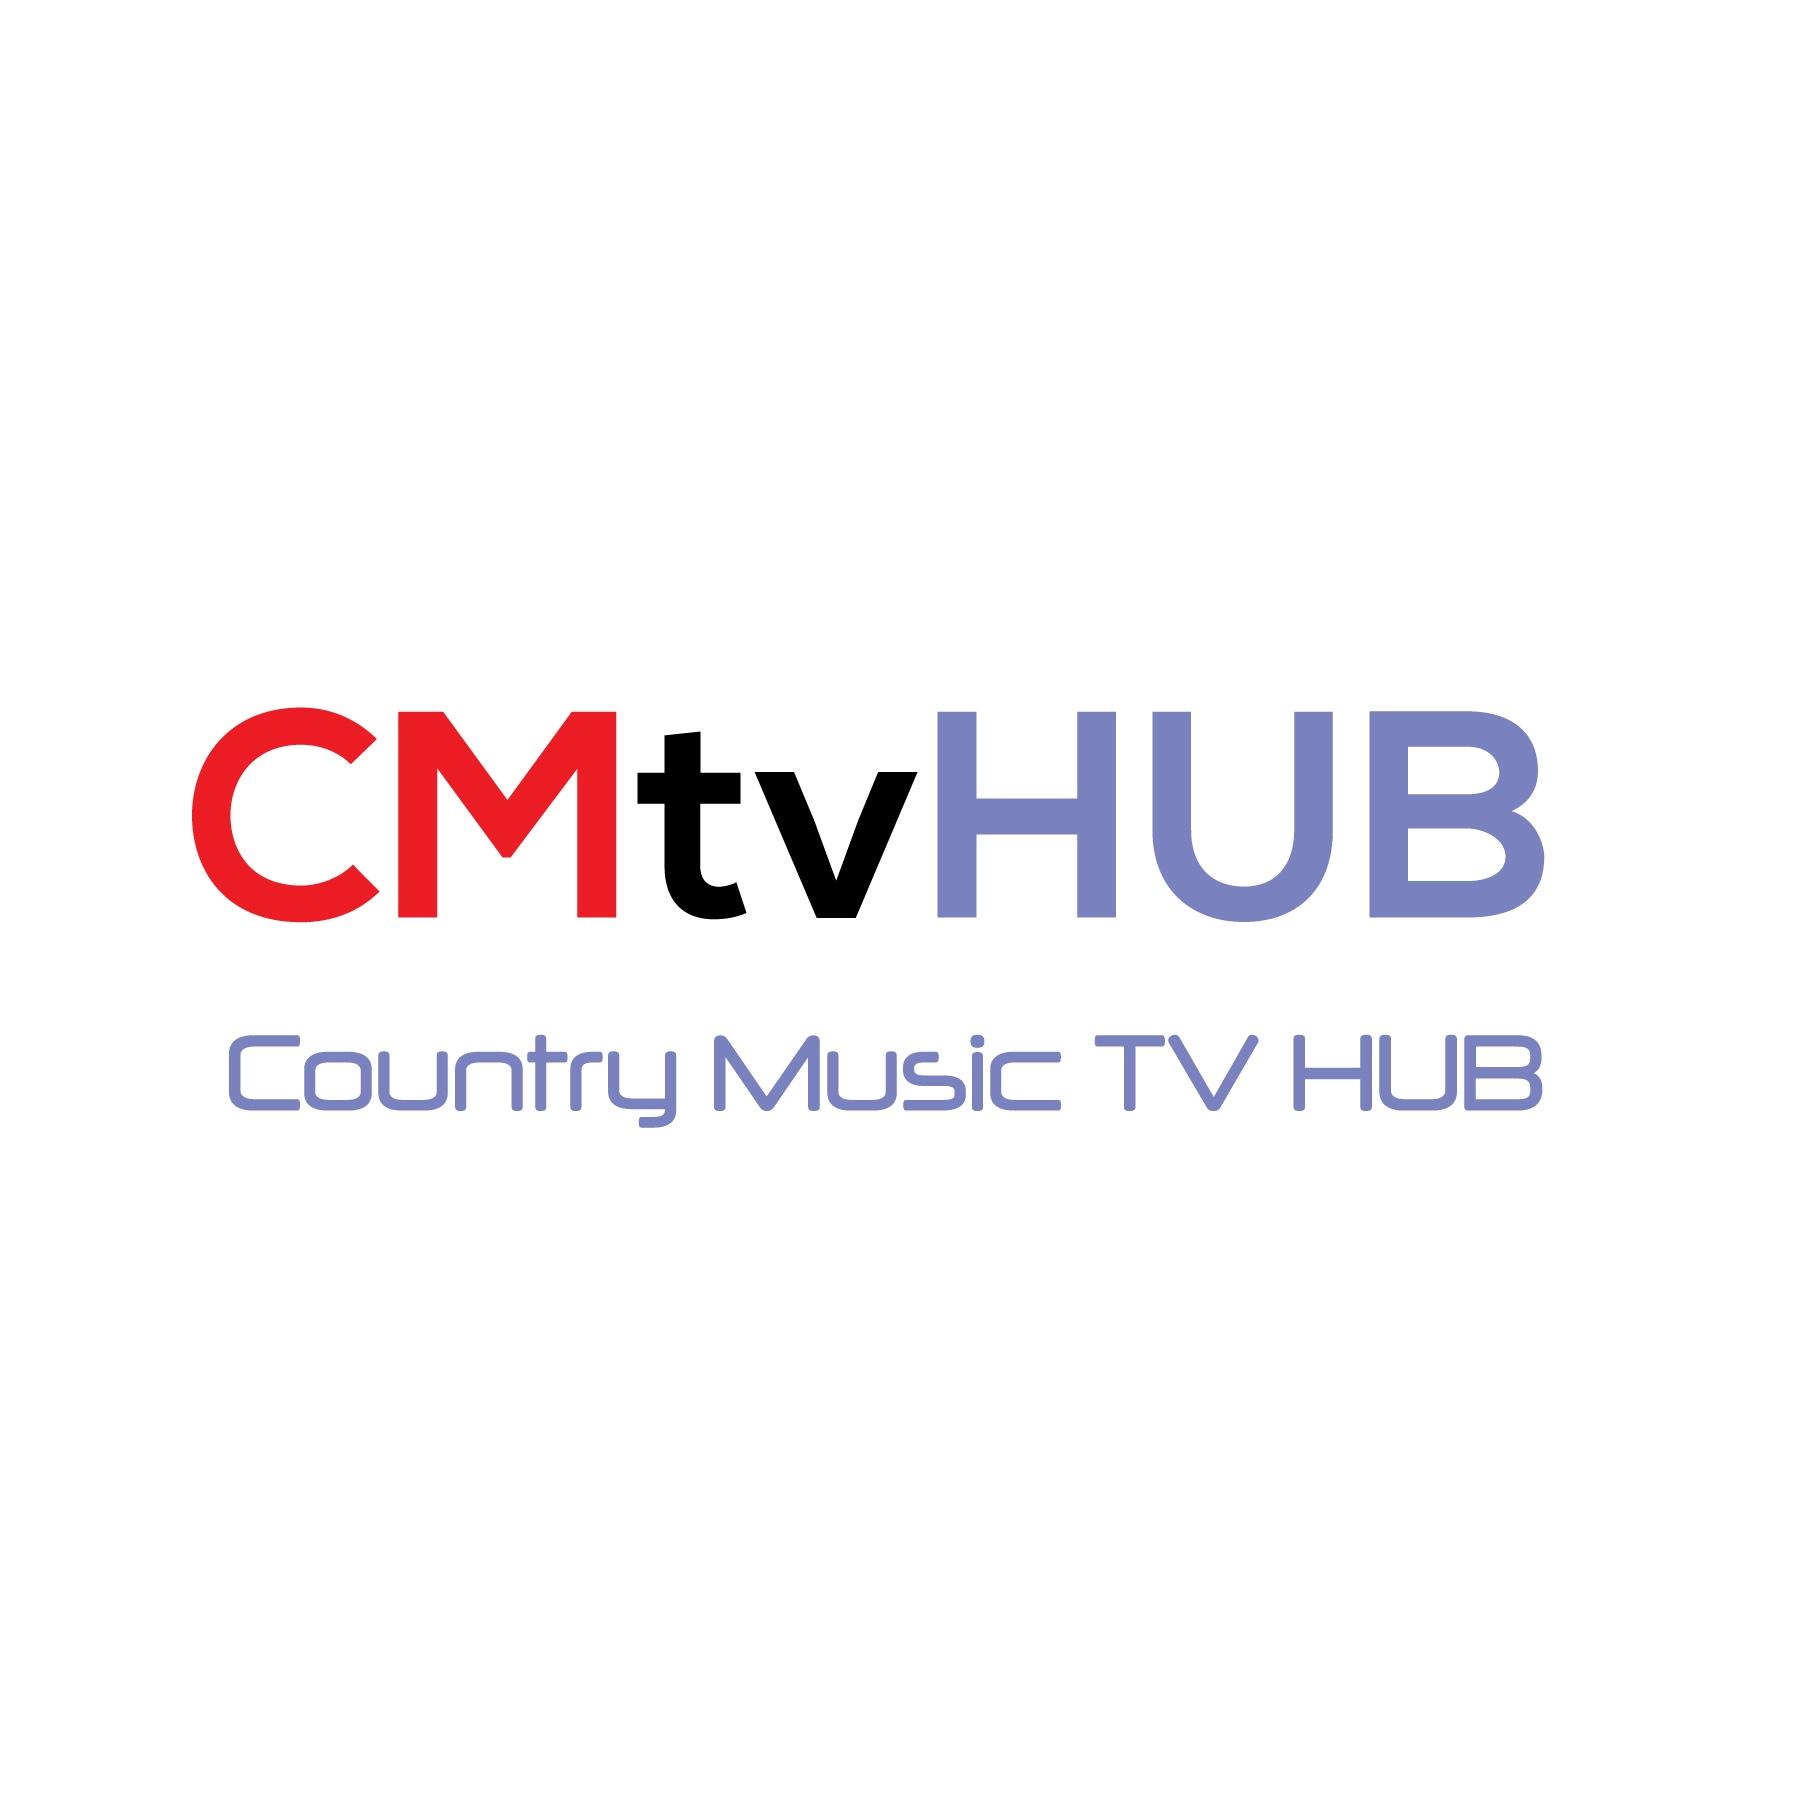 CMtvHUB